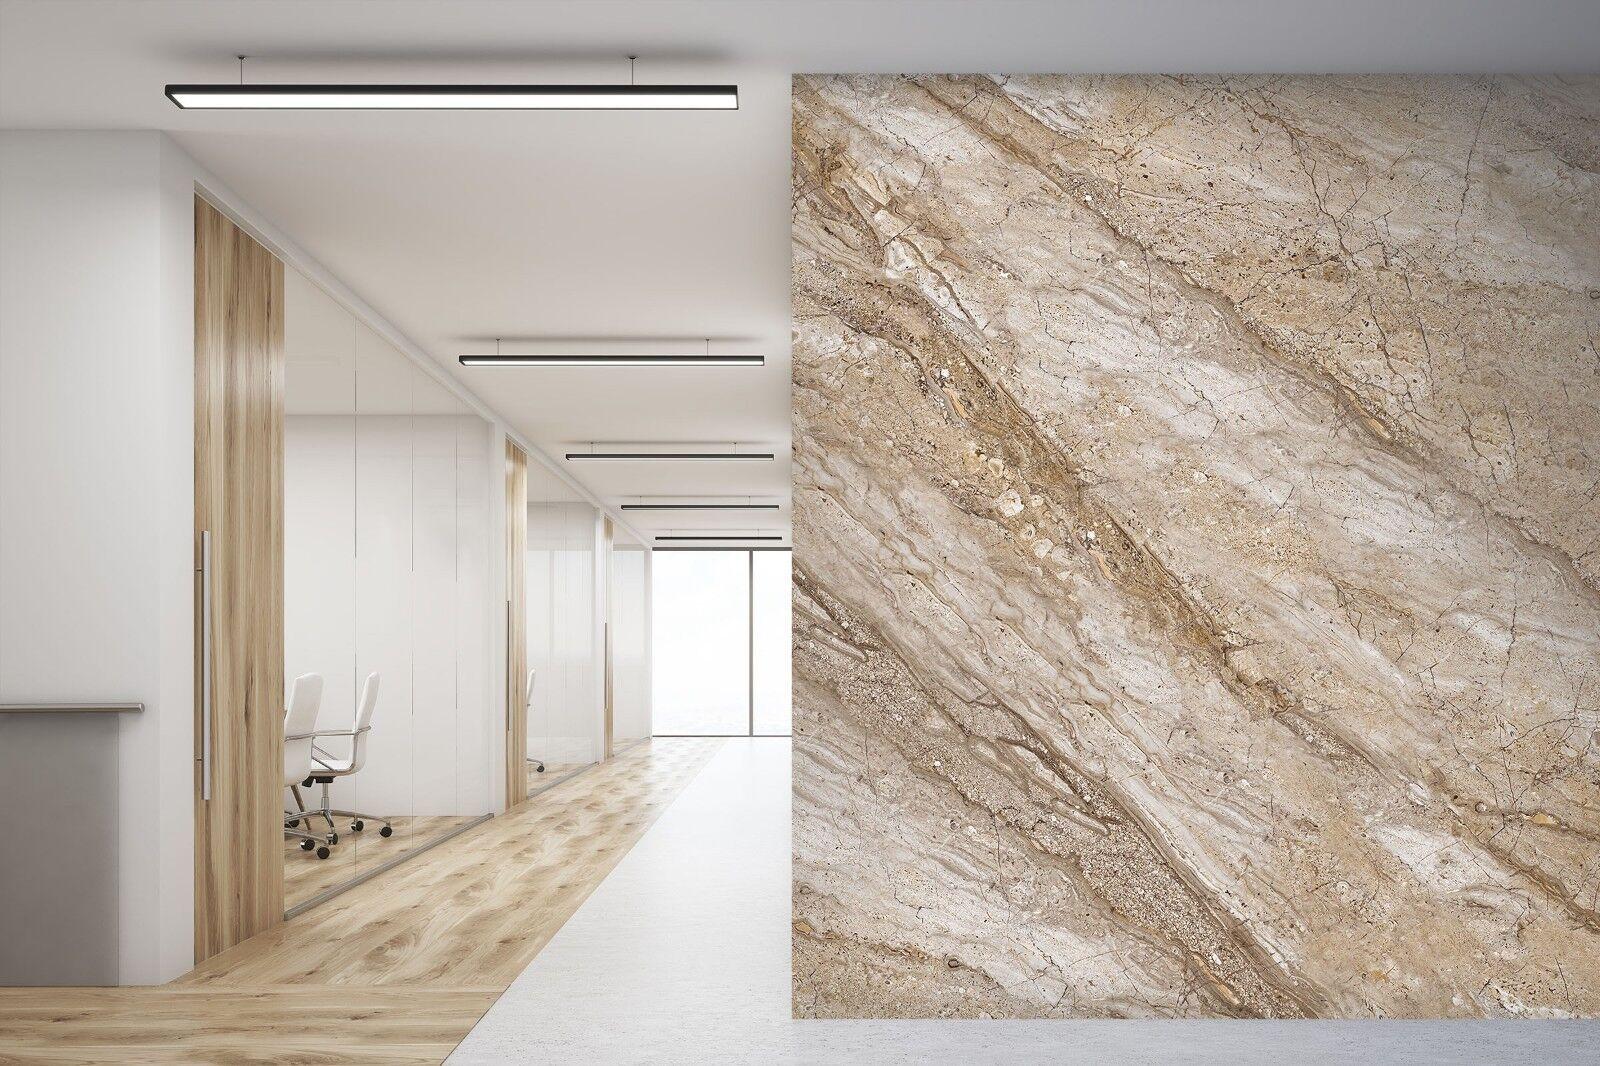 3D Steinmuster Kurve 6989 Textur Fliesen Marmor Tapeten Tapete Wandbild AJ